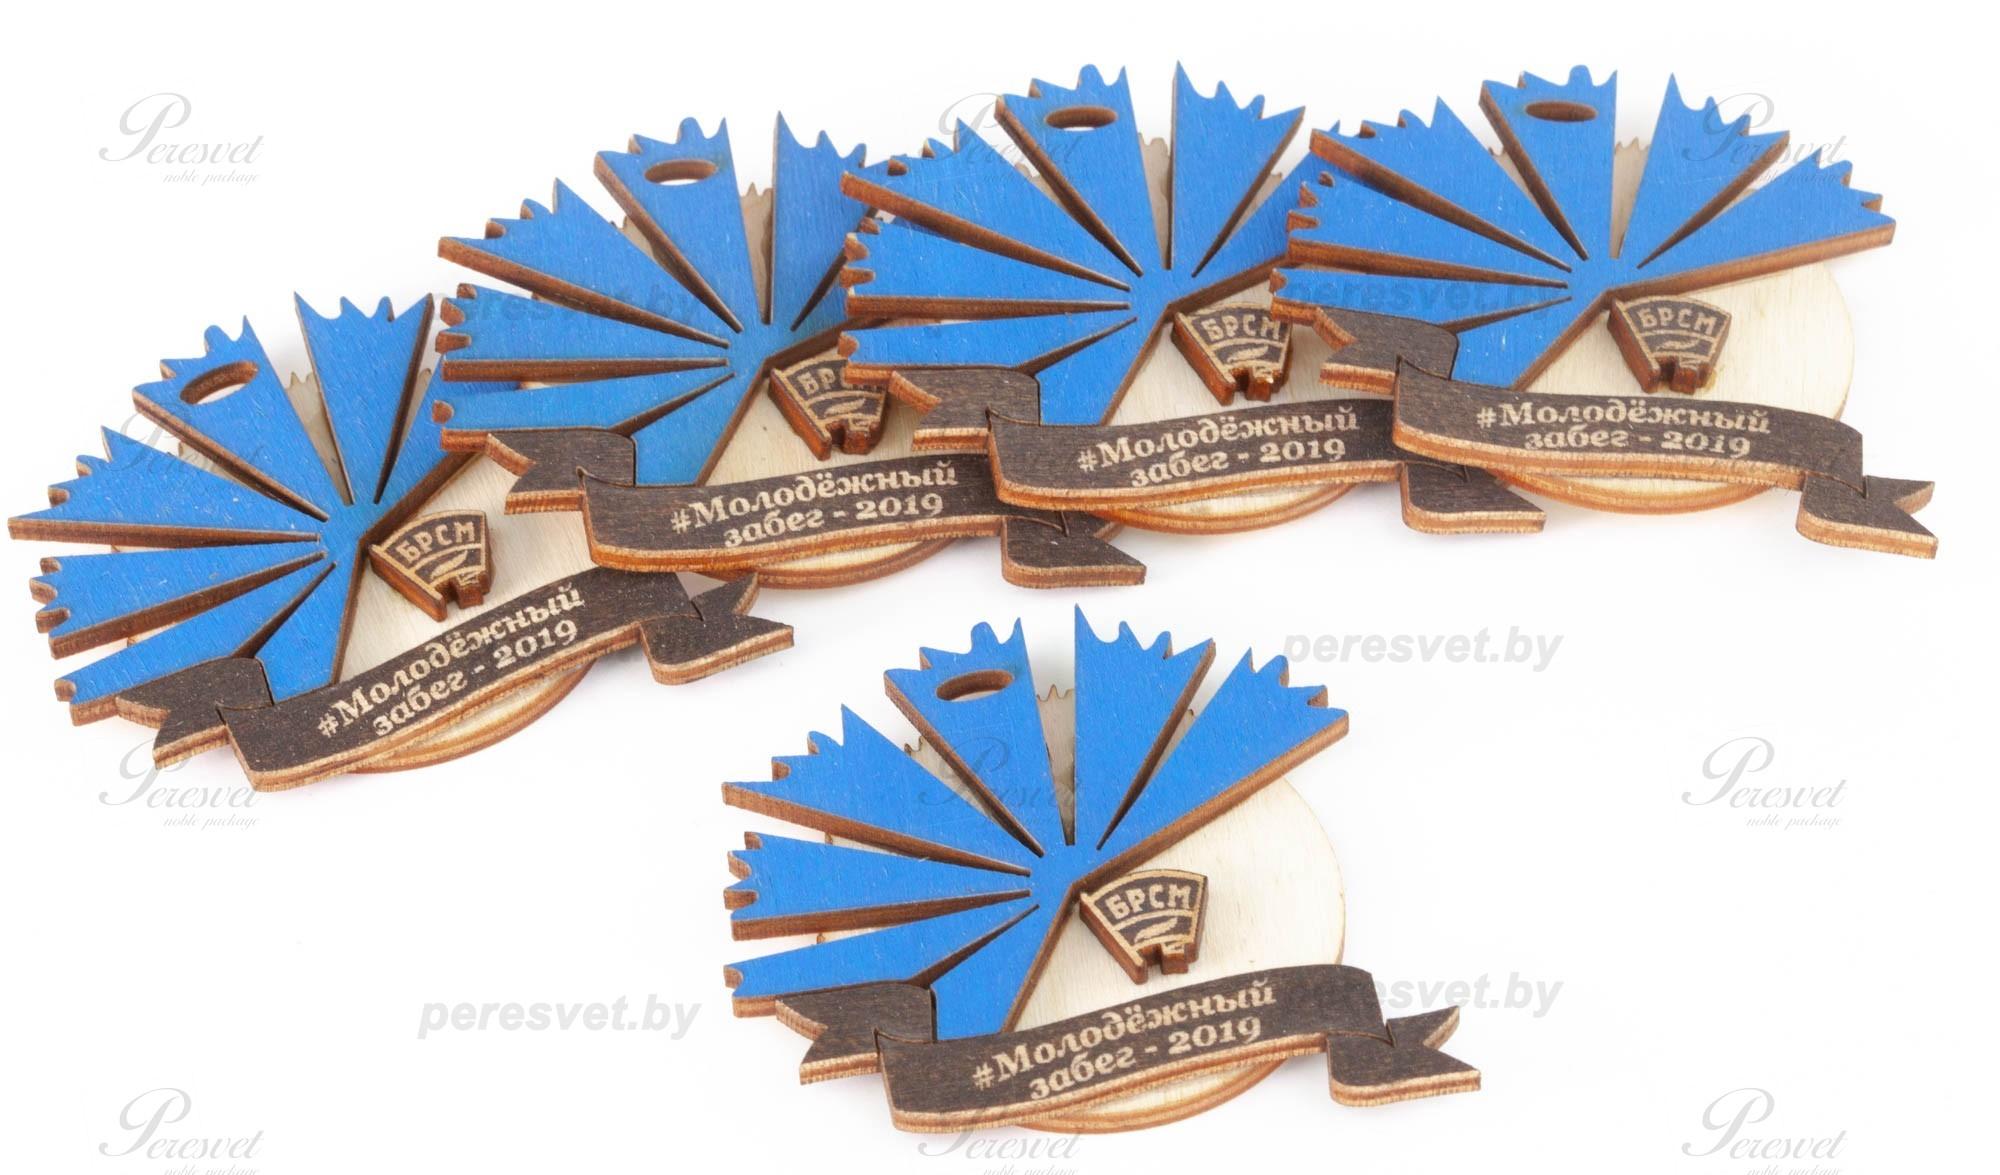 Объемная деревянная медаль для забега с покраской на peresvet.by